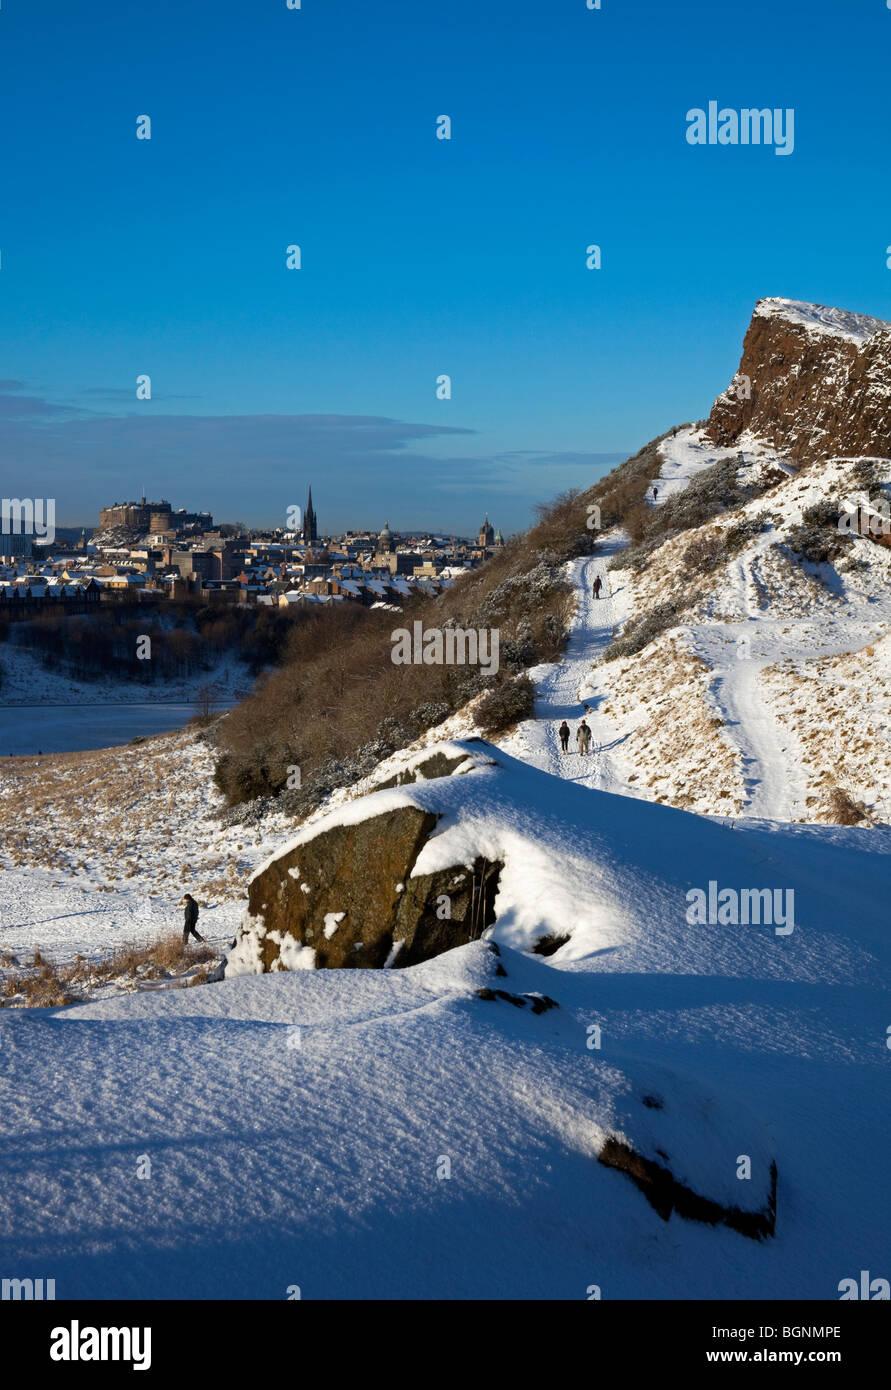 Winter snow scene Holyrood Park, Salisbury Crags, Edinburgh, Scotland, UK Europe - Stock Image